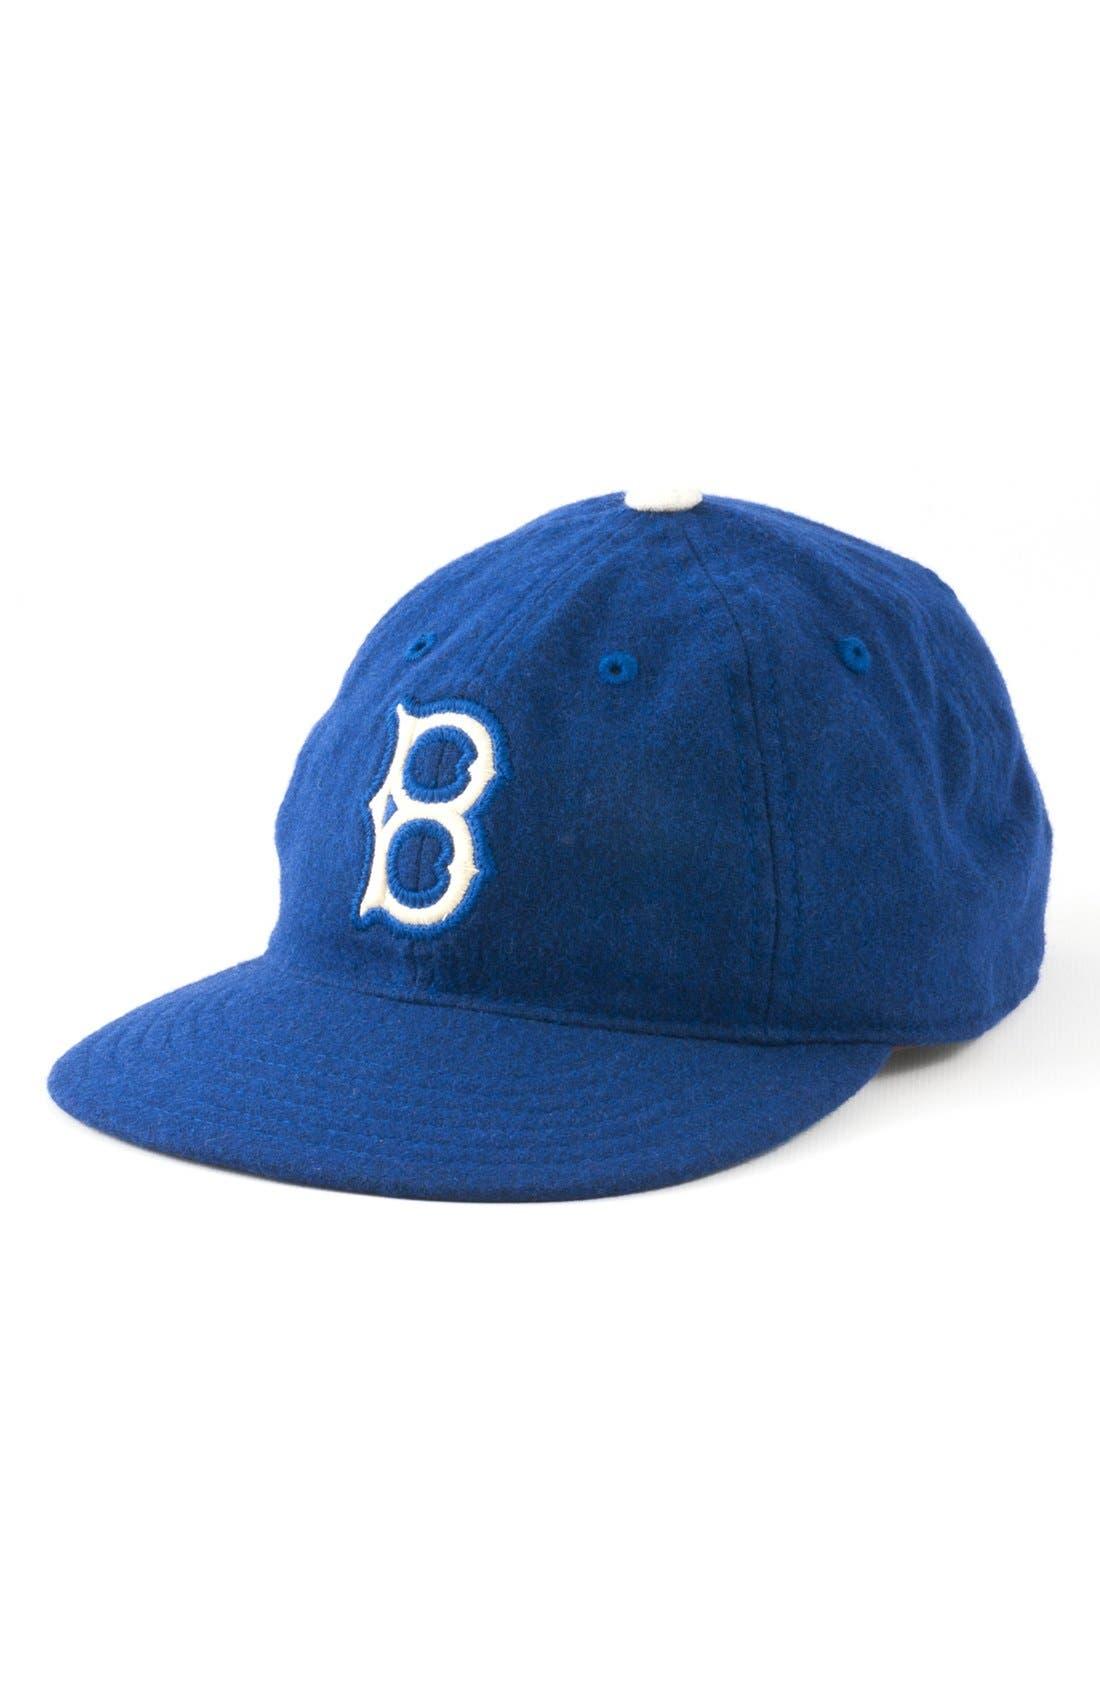 Main Image - American Needle 'Brooklyn Dodgers - Statesman' Baseball Cap